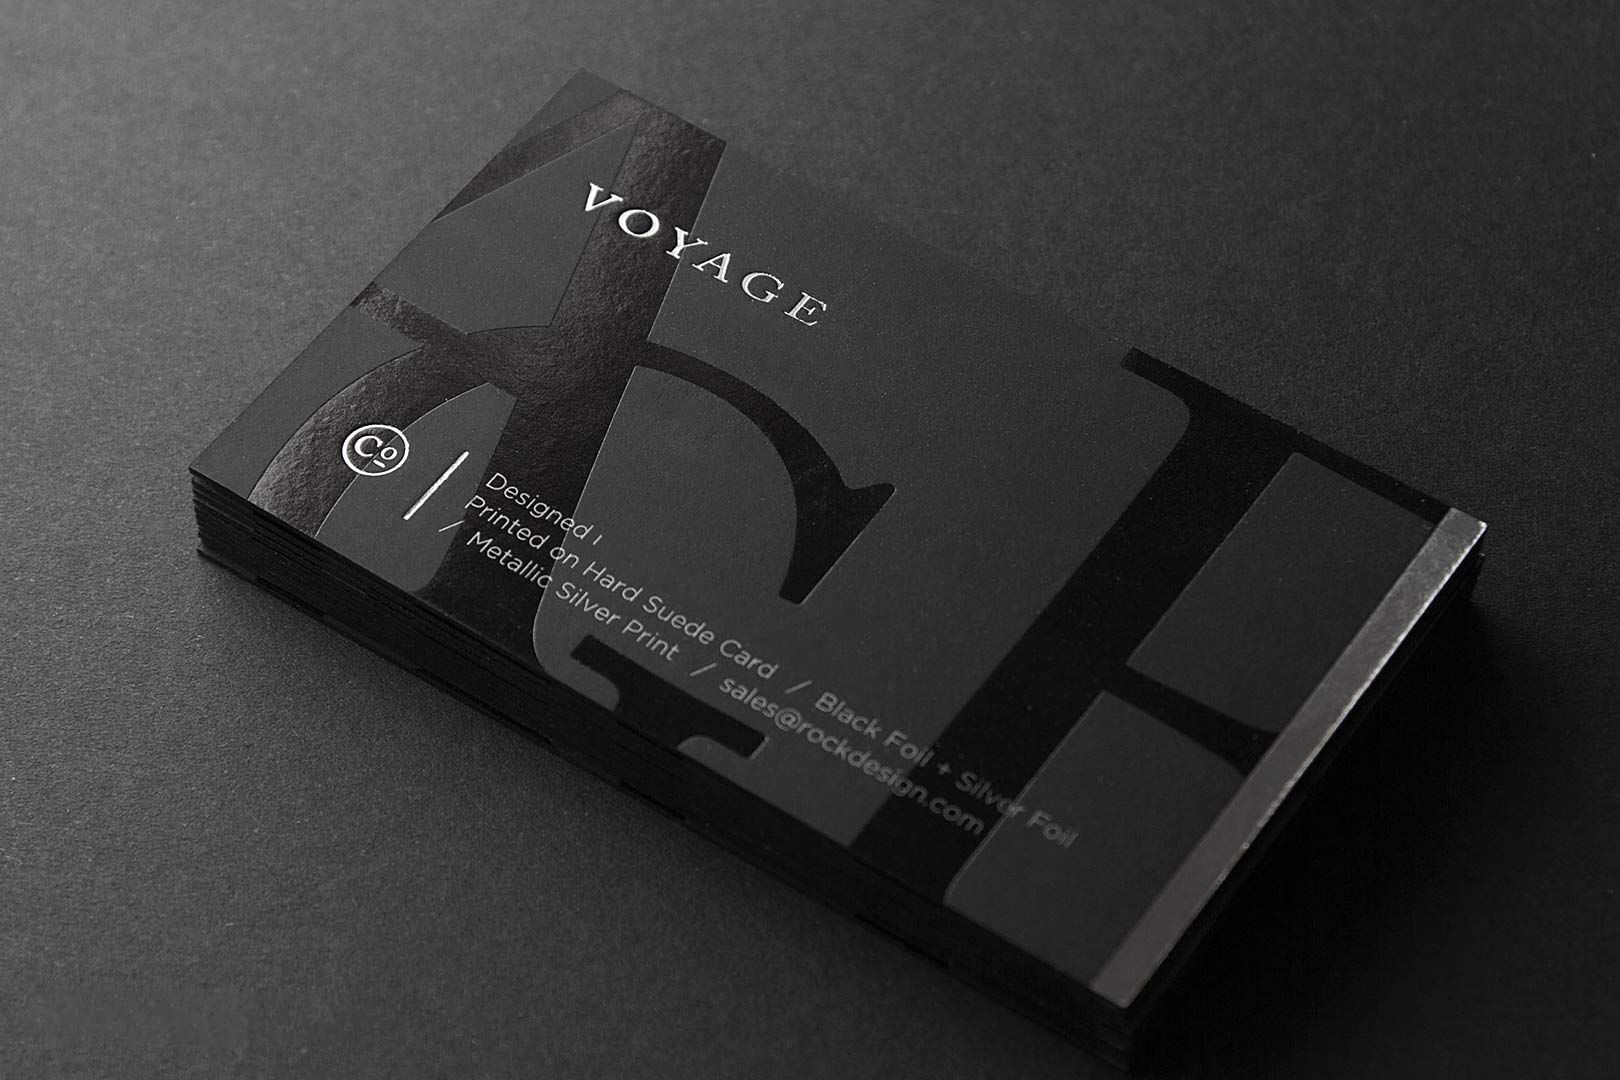 hot foil business card color: white, black, silver https://www.bce ...